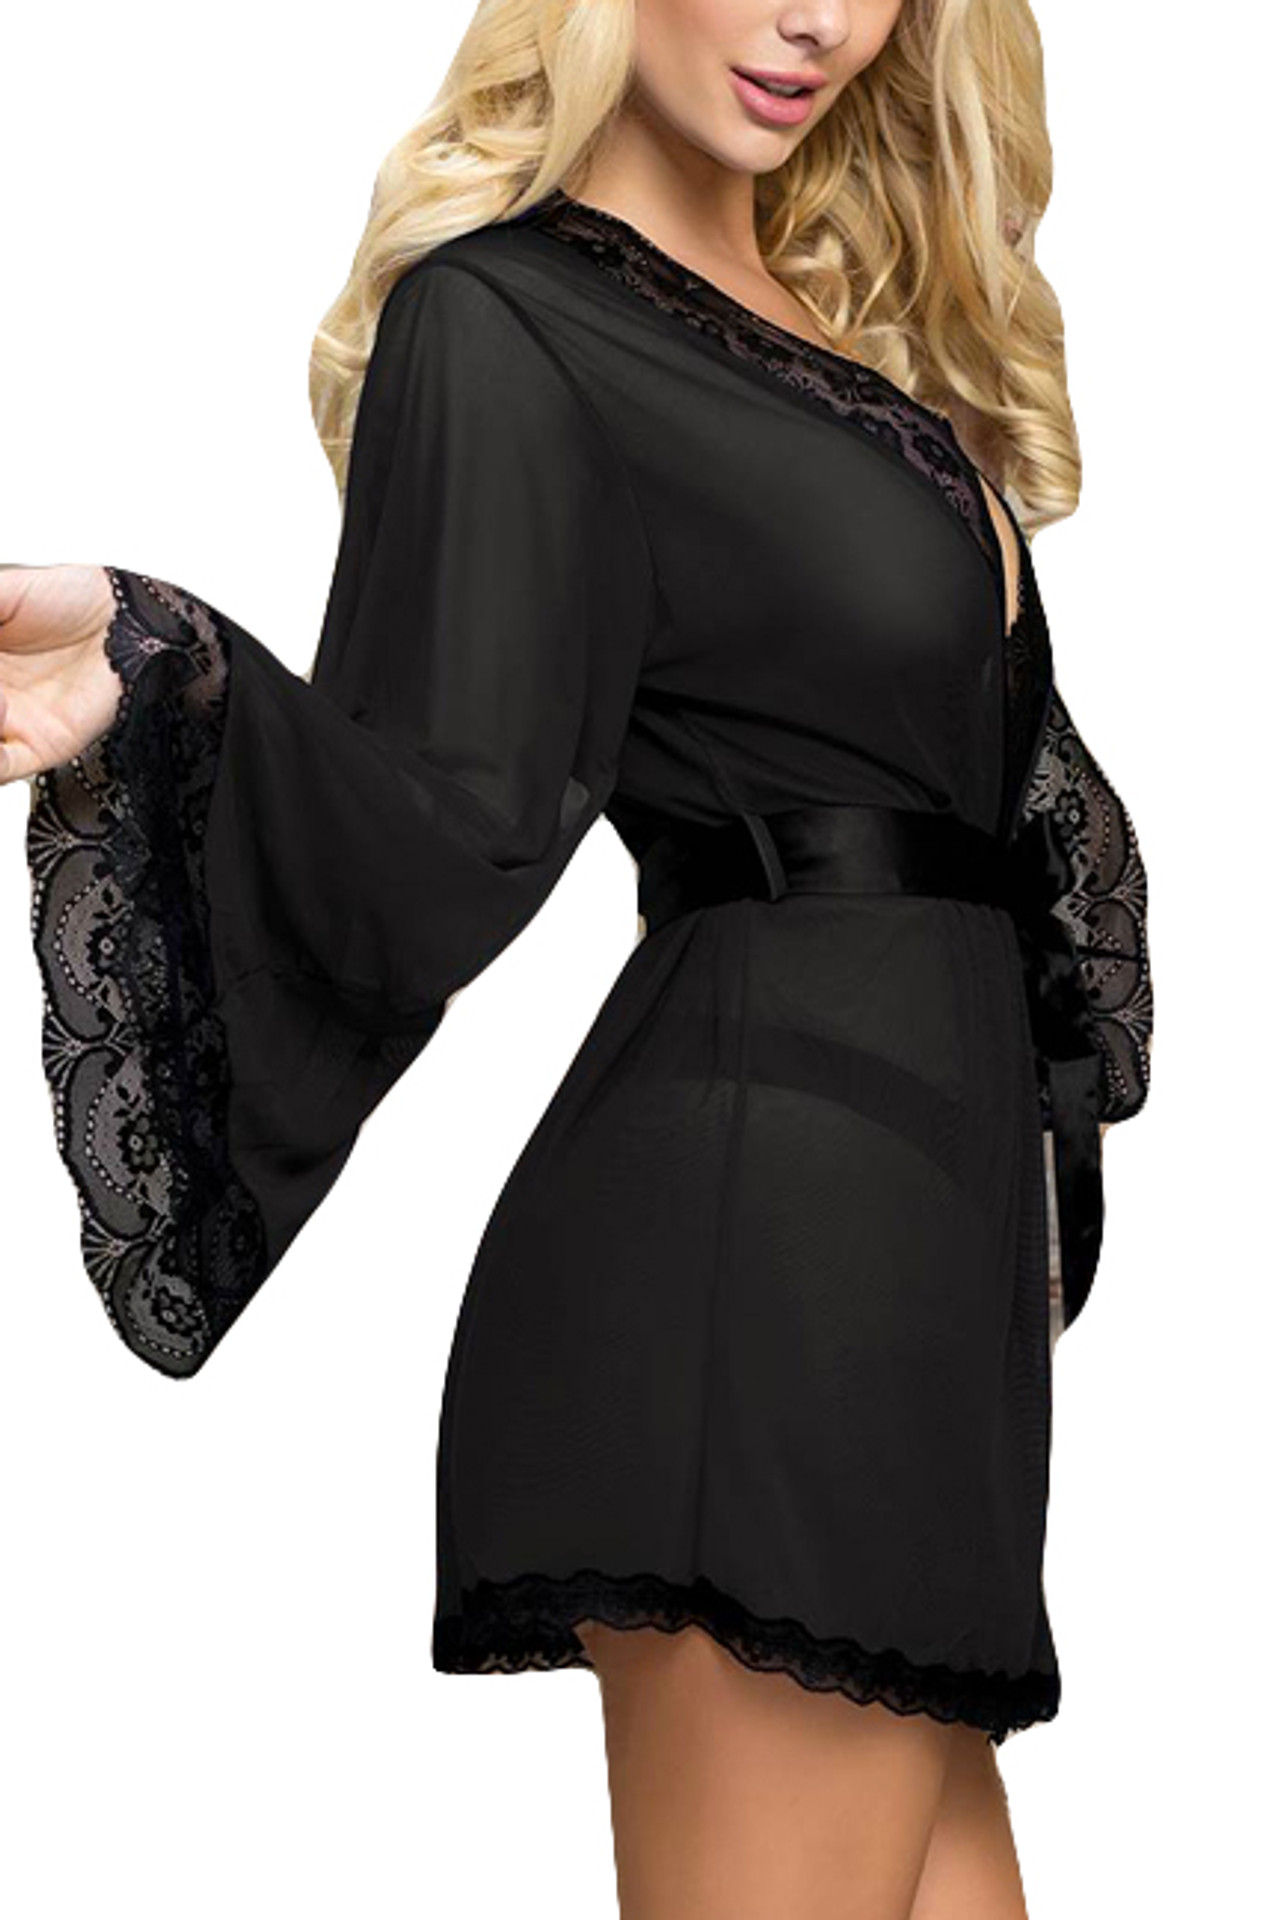 Matilda Black Sheer Lace Elegant Kimono Robe